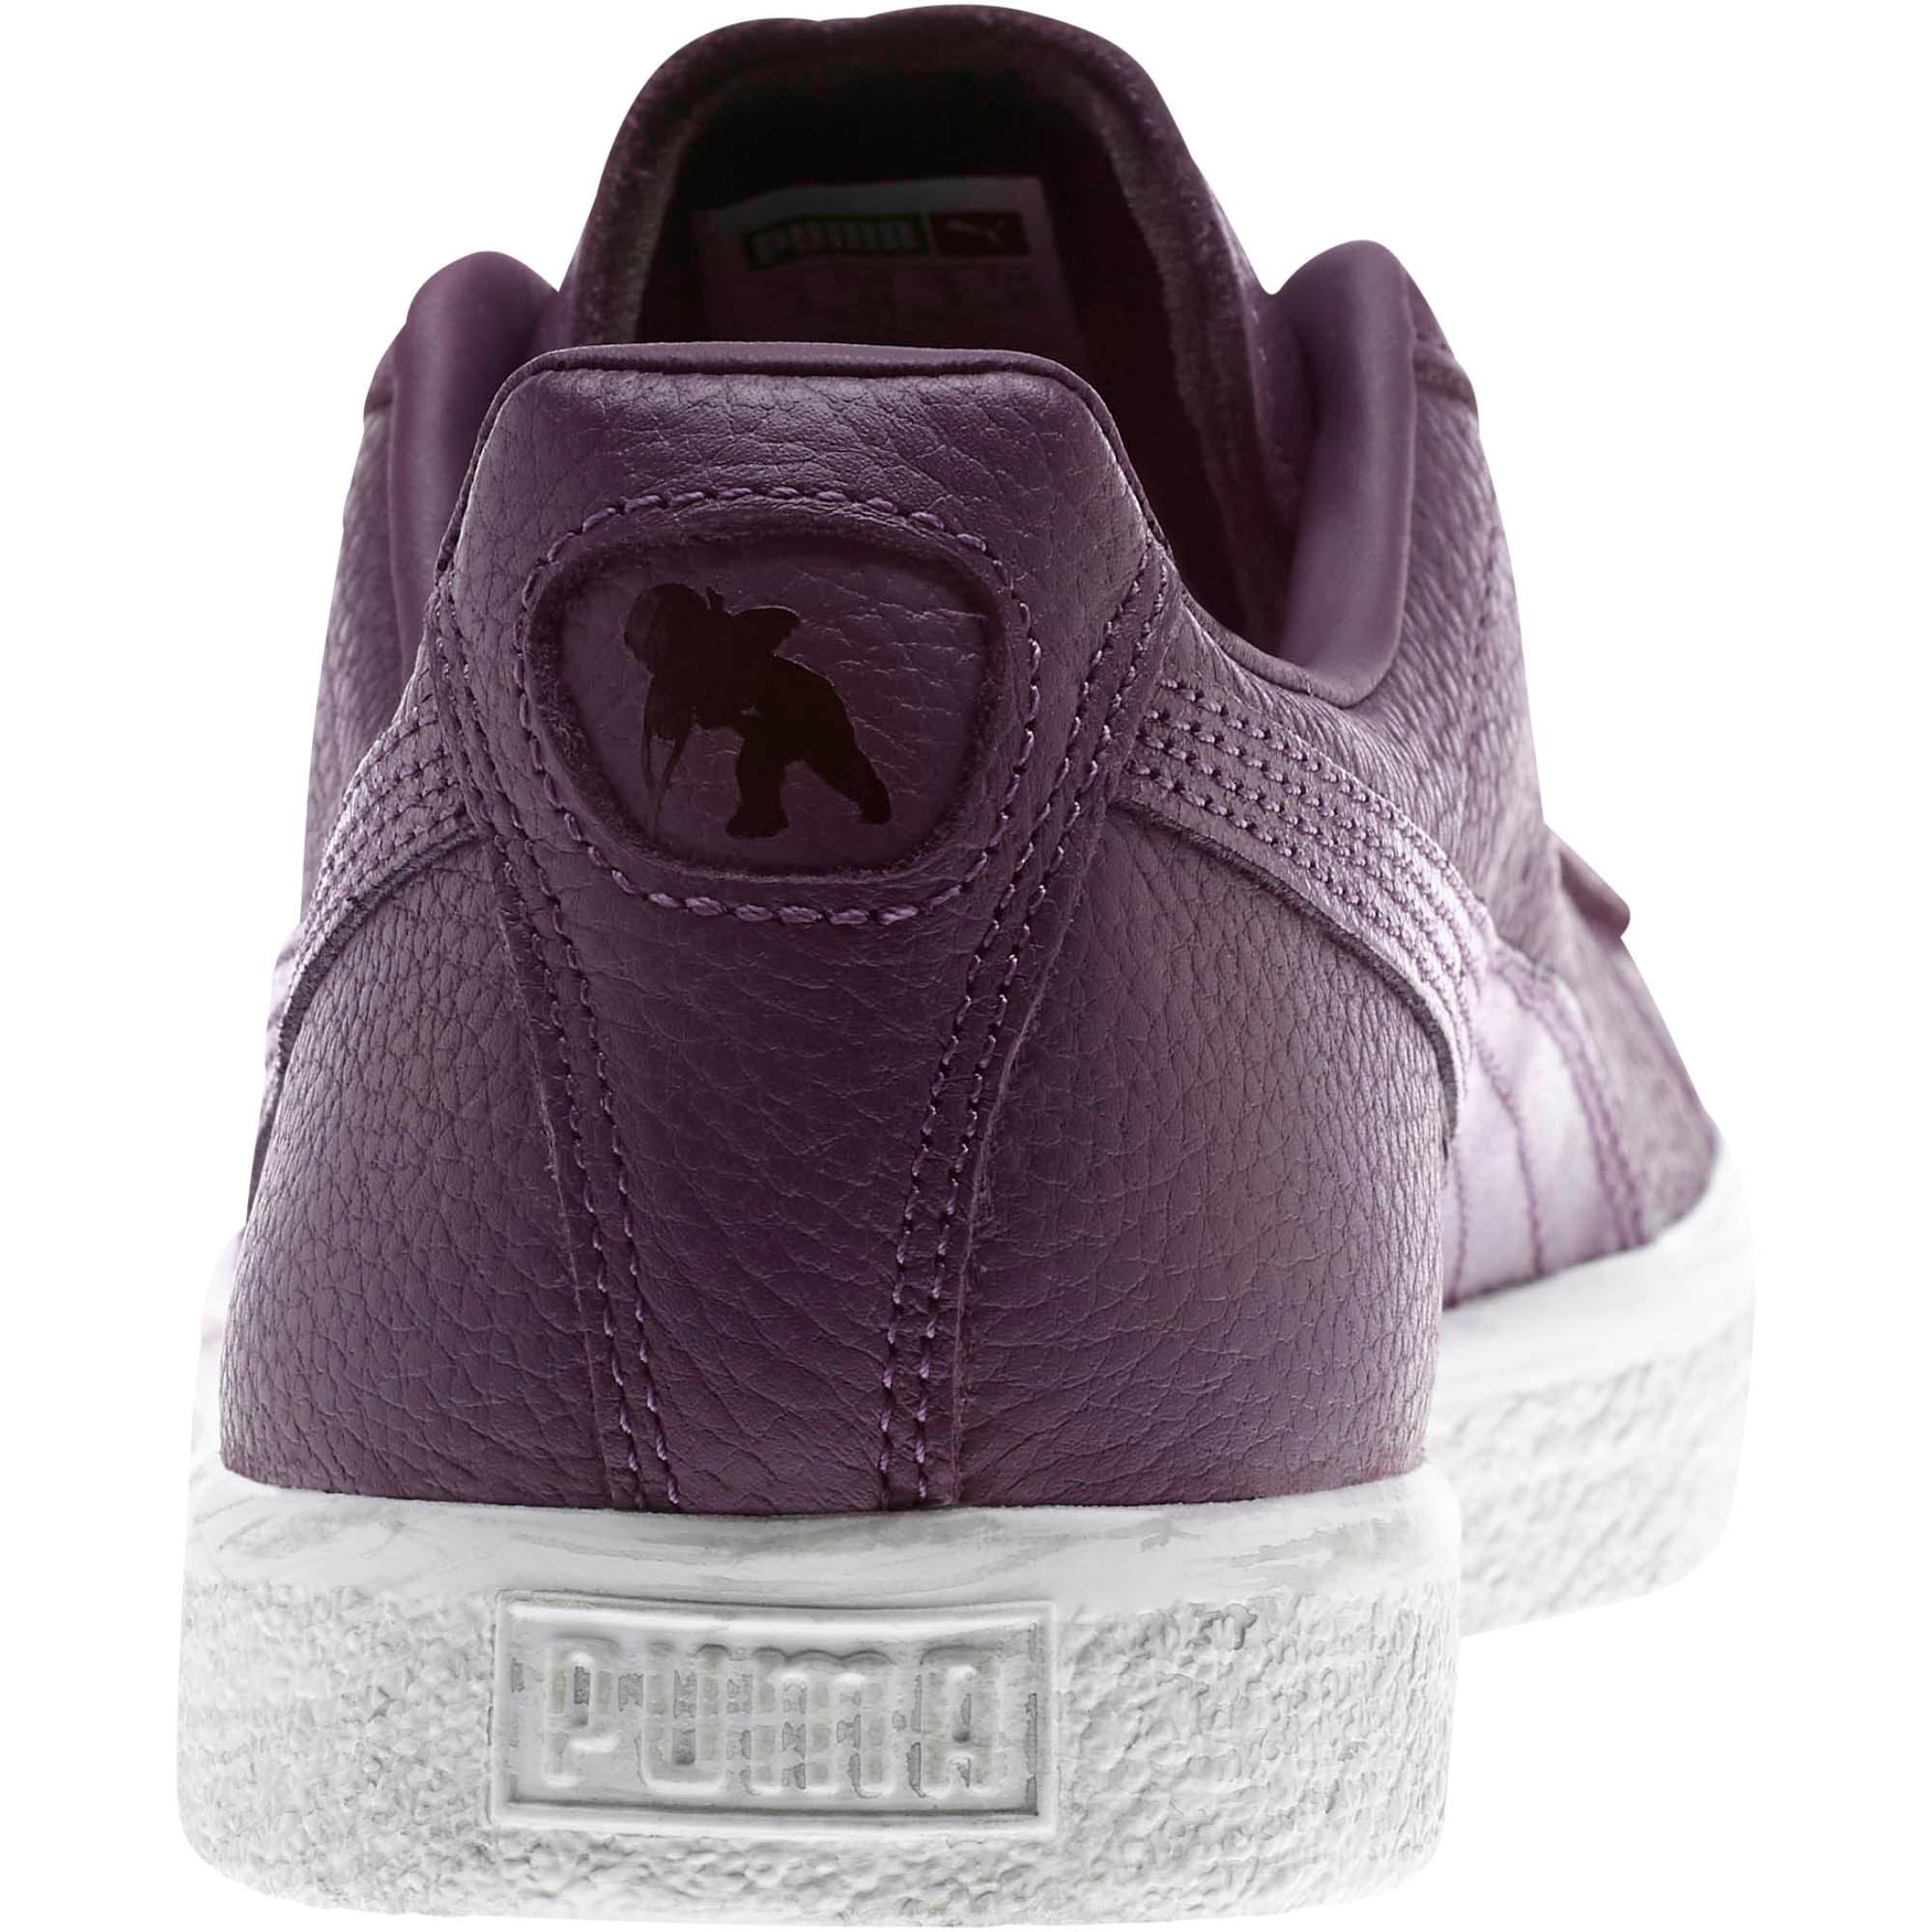 Thumbnail 3 of Clyde x PRPS Sneakers, Indigo-Puma Black, medium